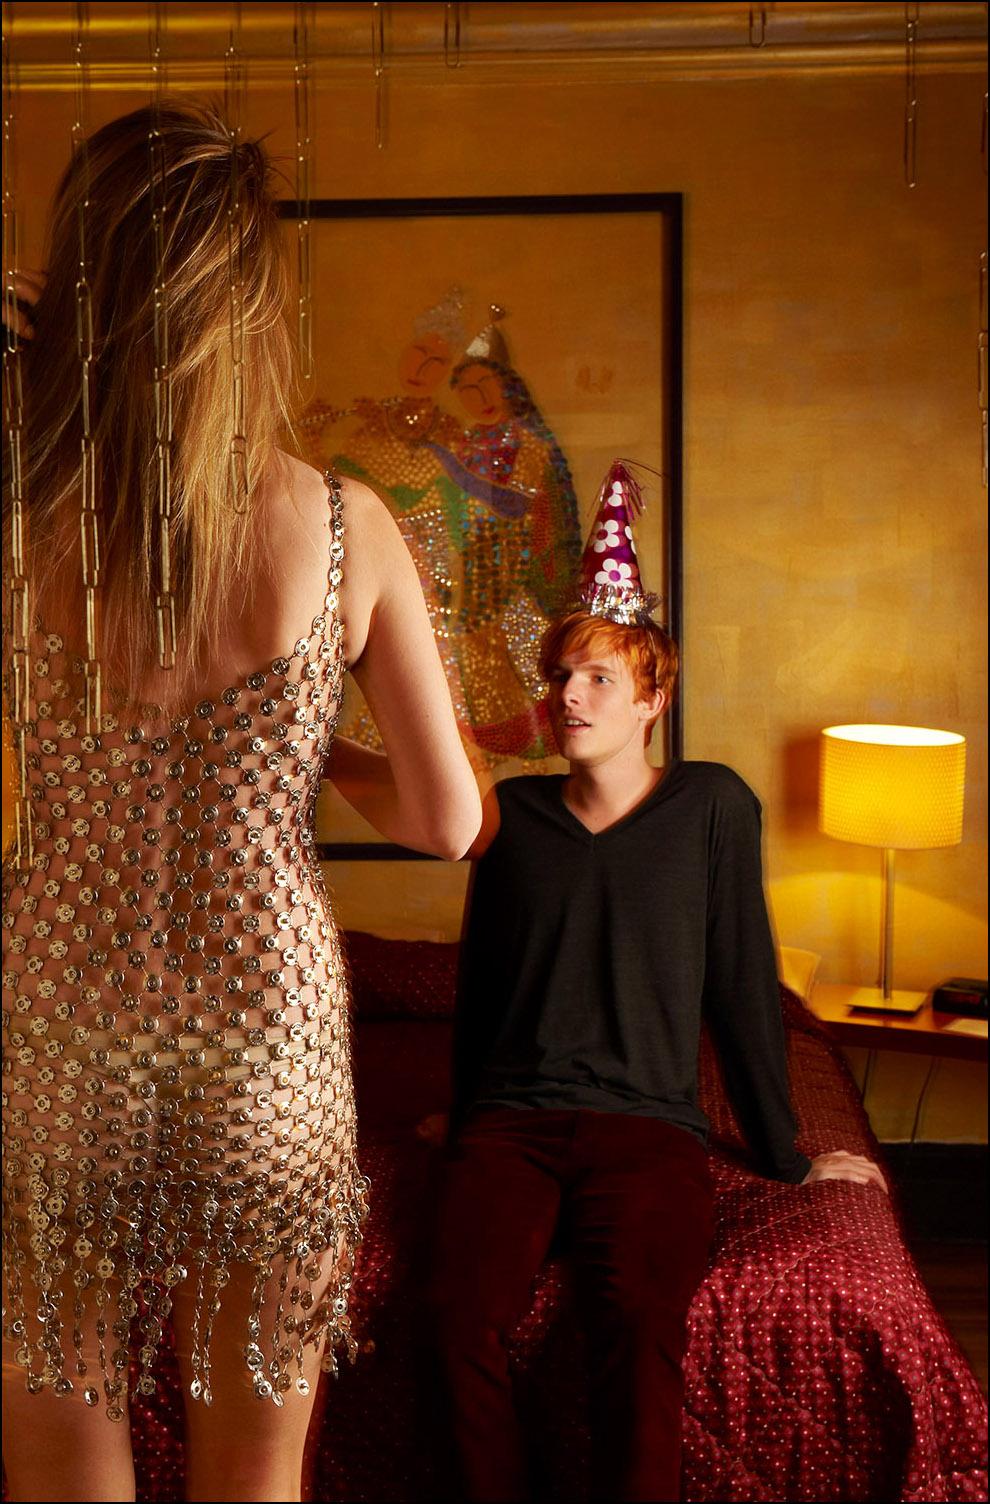 Austin's Birthday Party, 2009